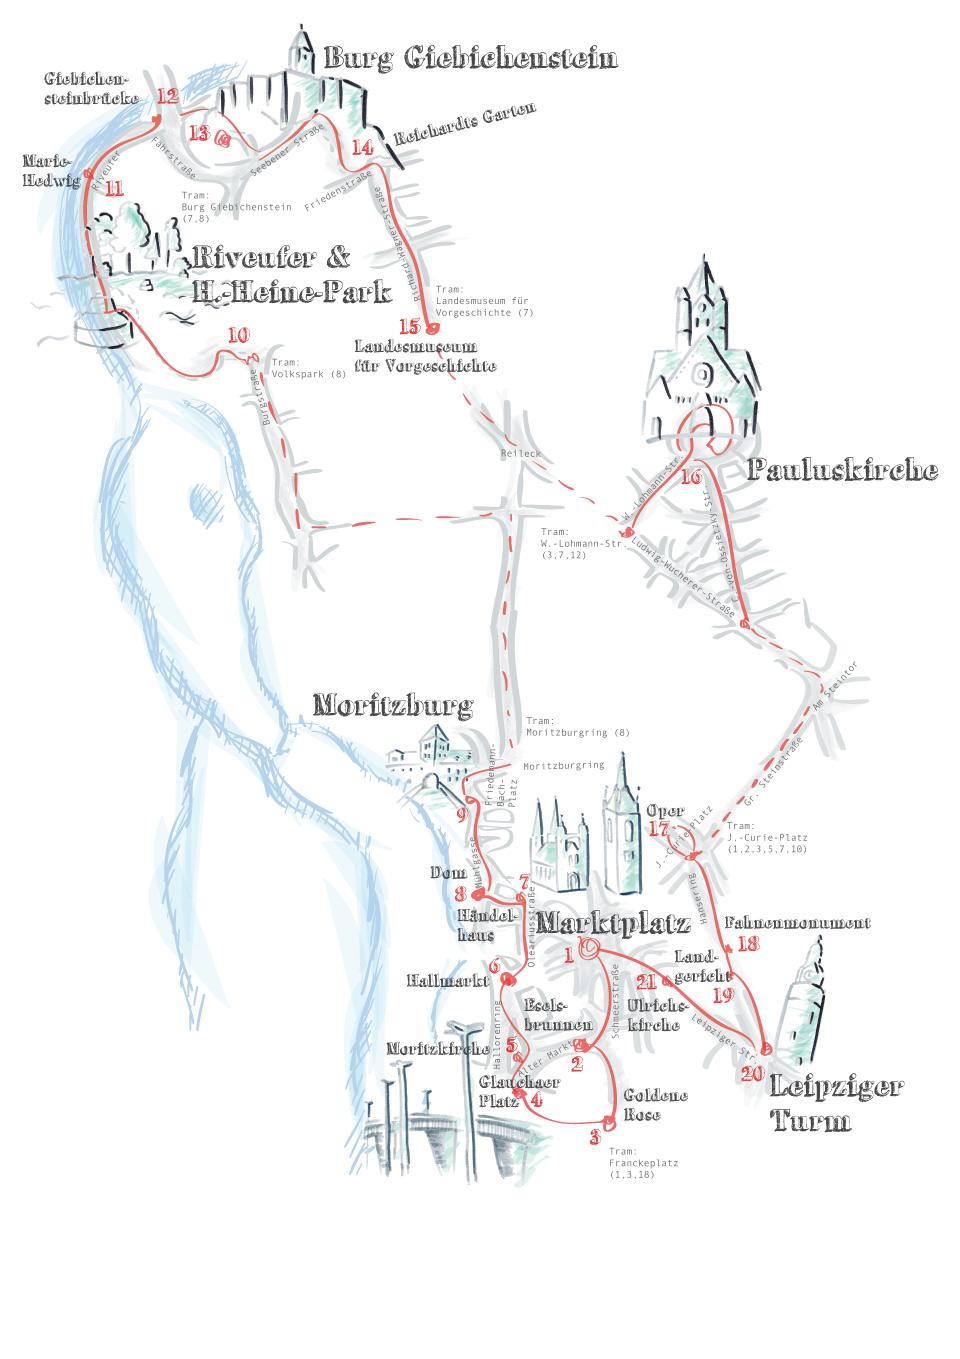 Illustration des Weges der Halle-Foto-Tour